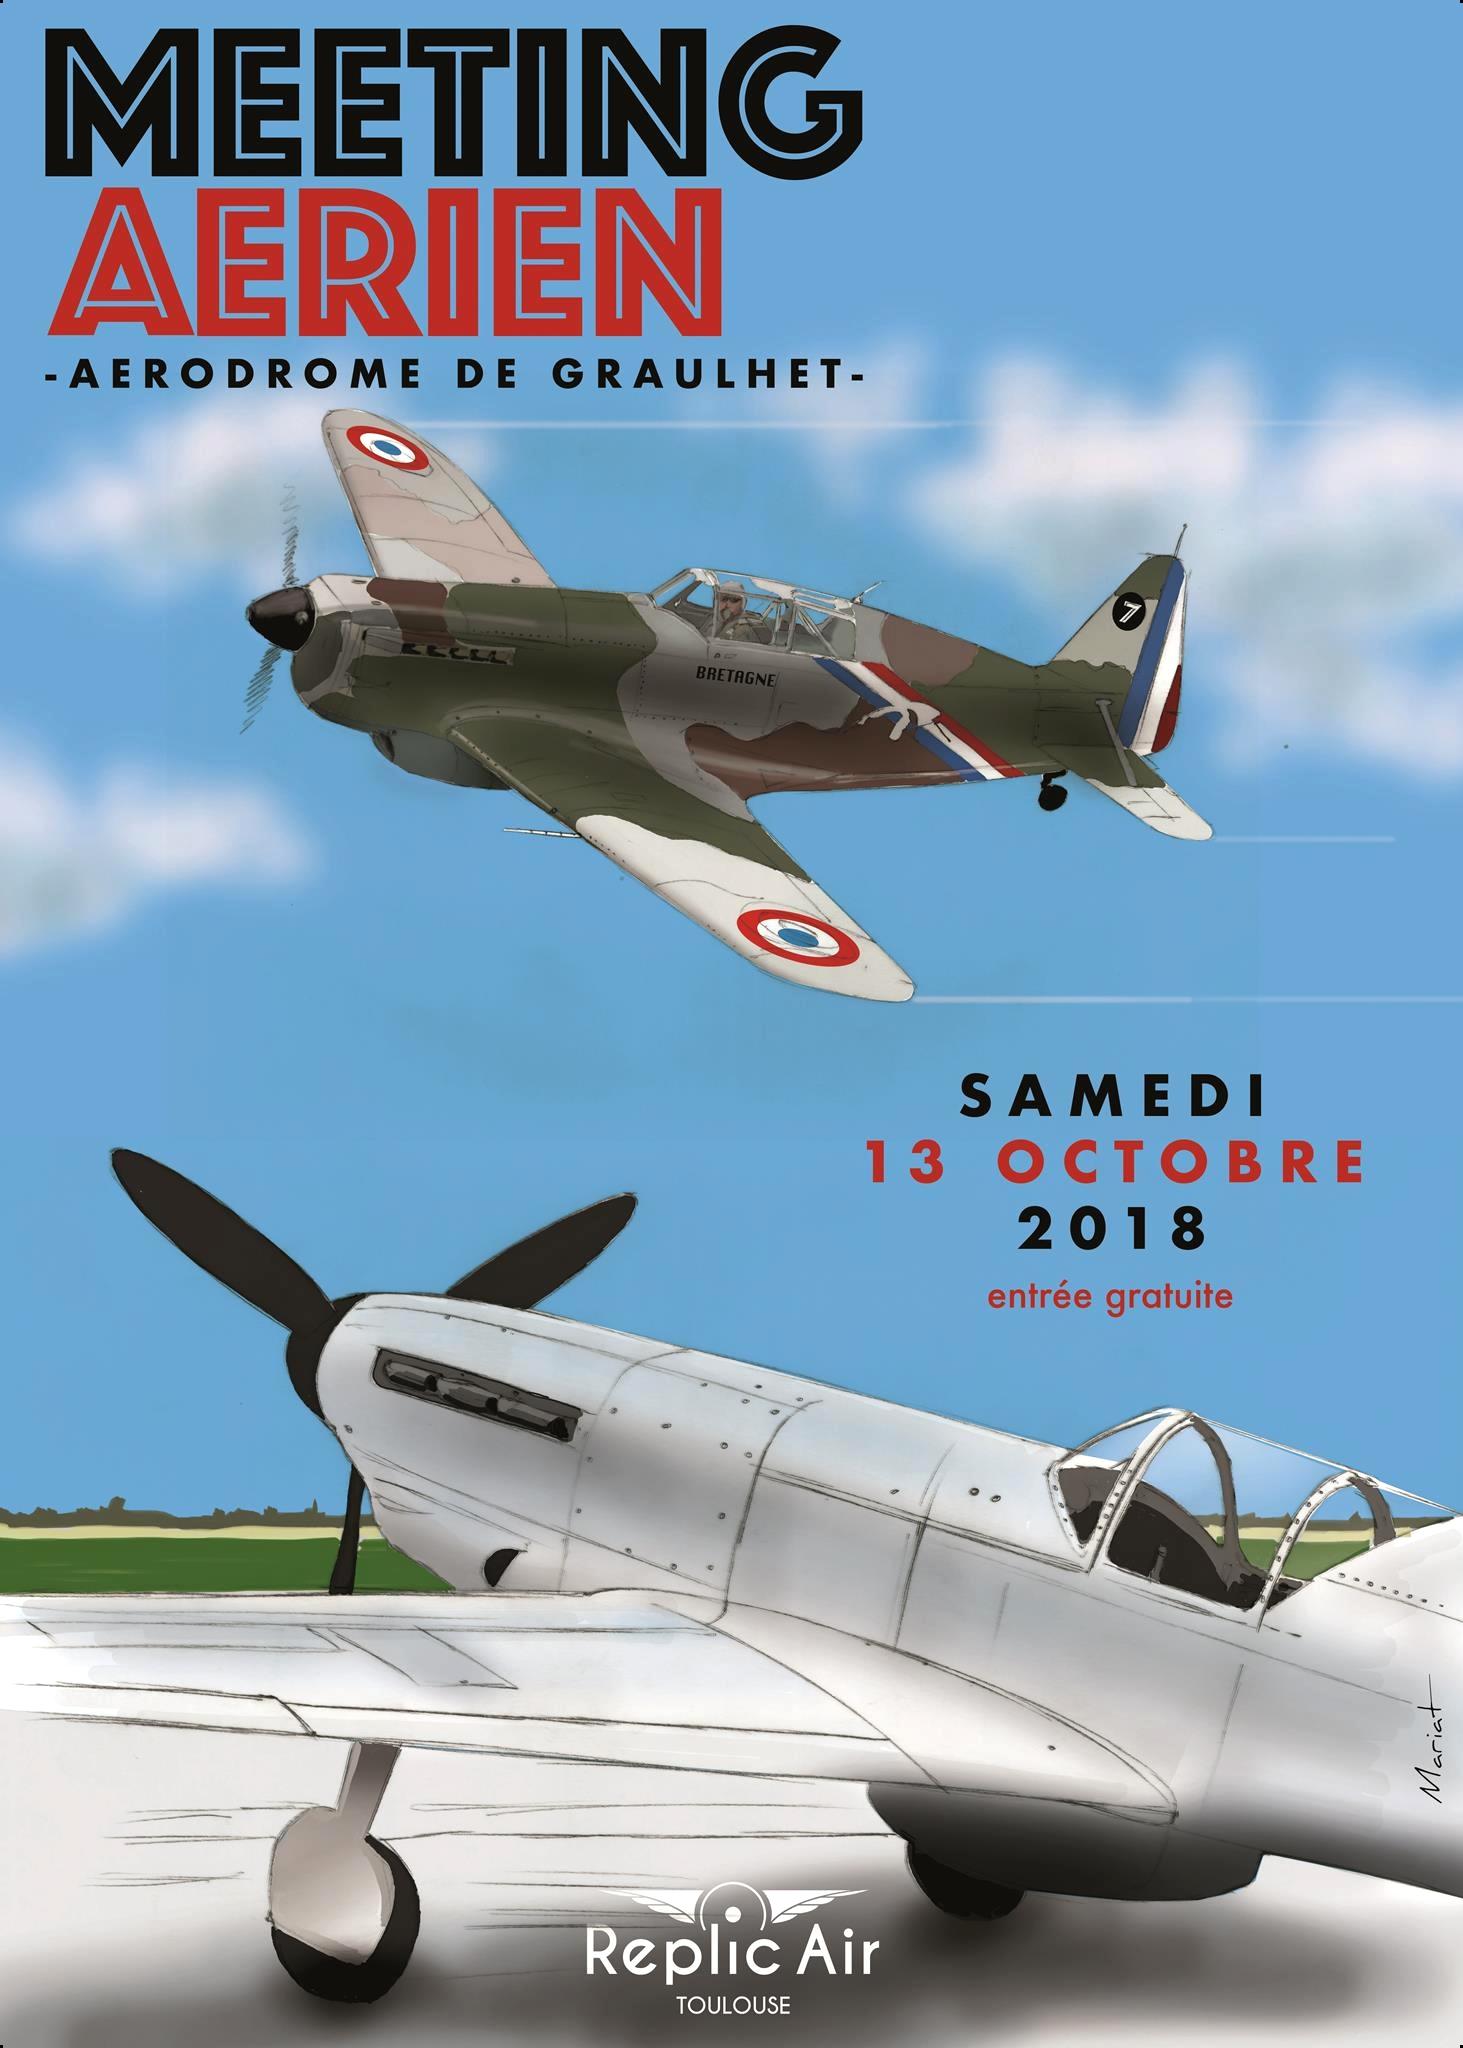 Meeting Aerien RéplicAir 2018 , Aérodrome de Gaillac - Graulhet 2018